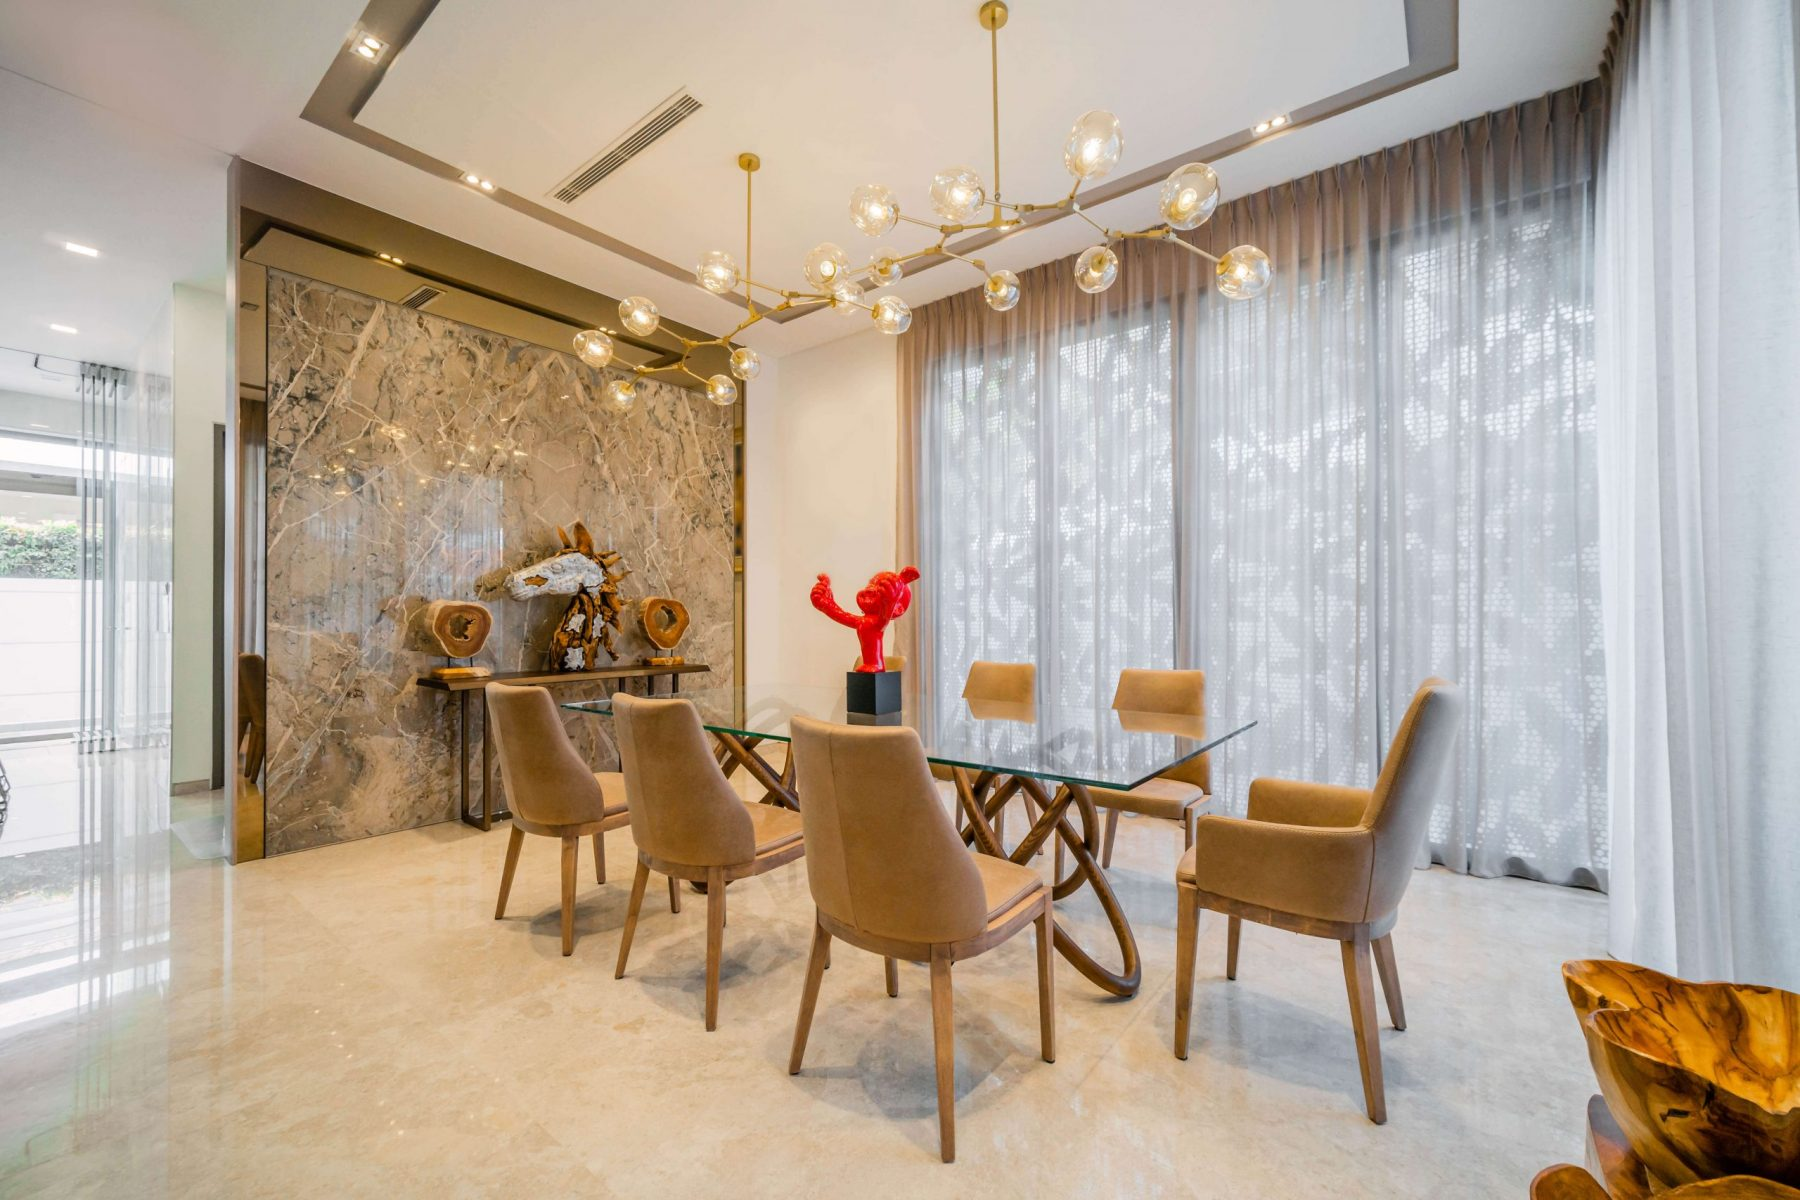 6 Most Important Key Principles of Interior Design